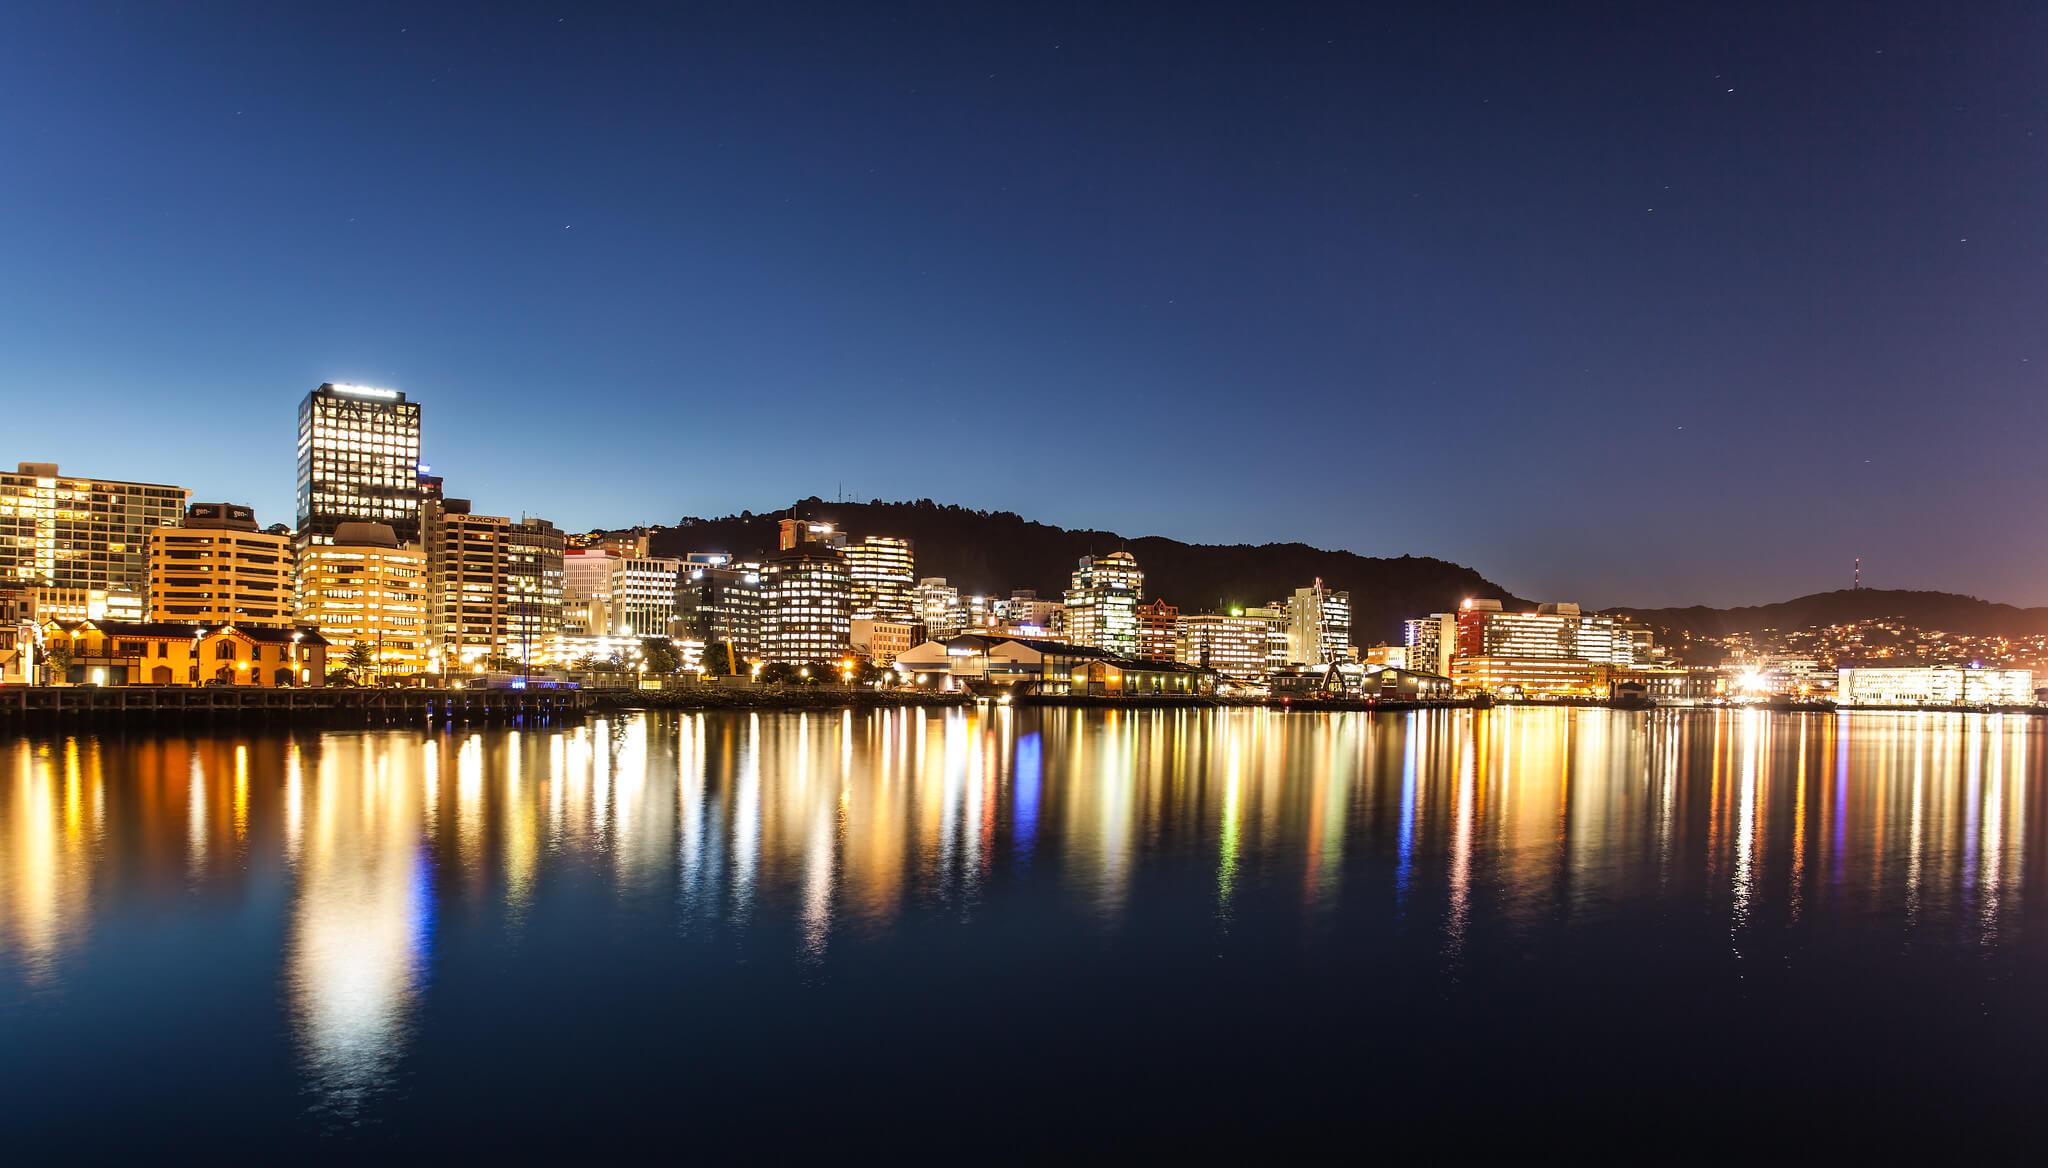 Wellington nightlife brings the city alive